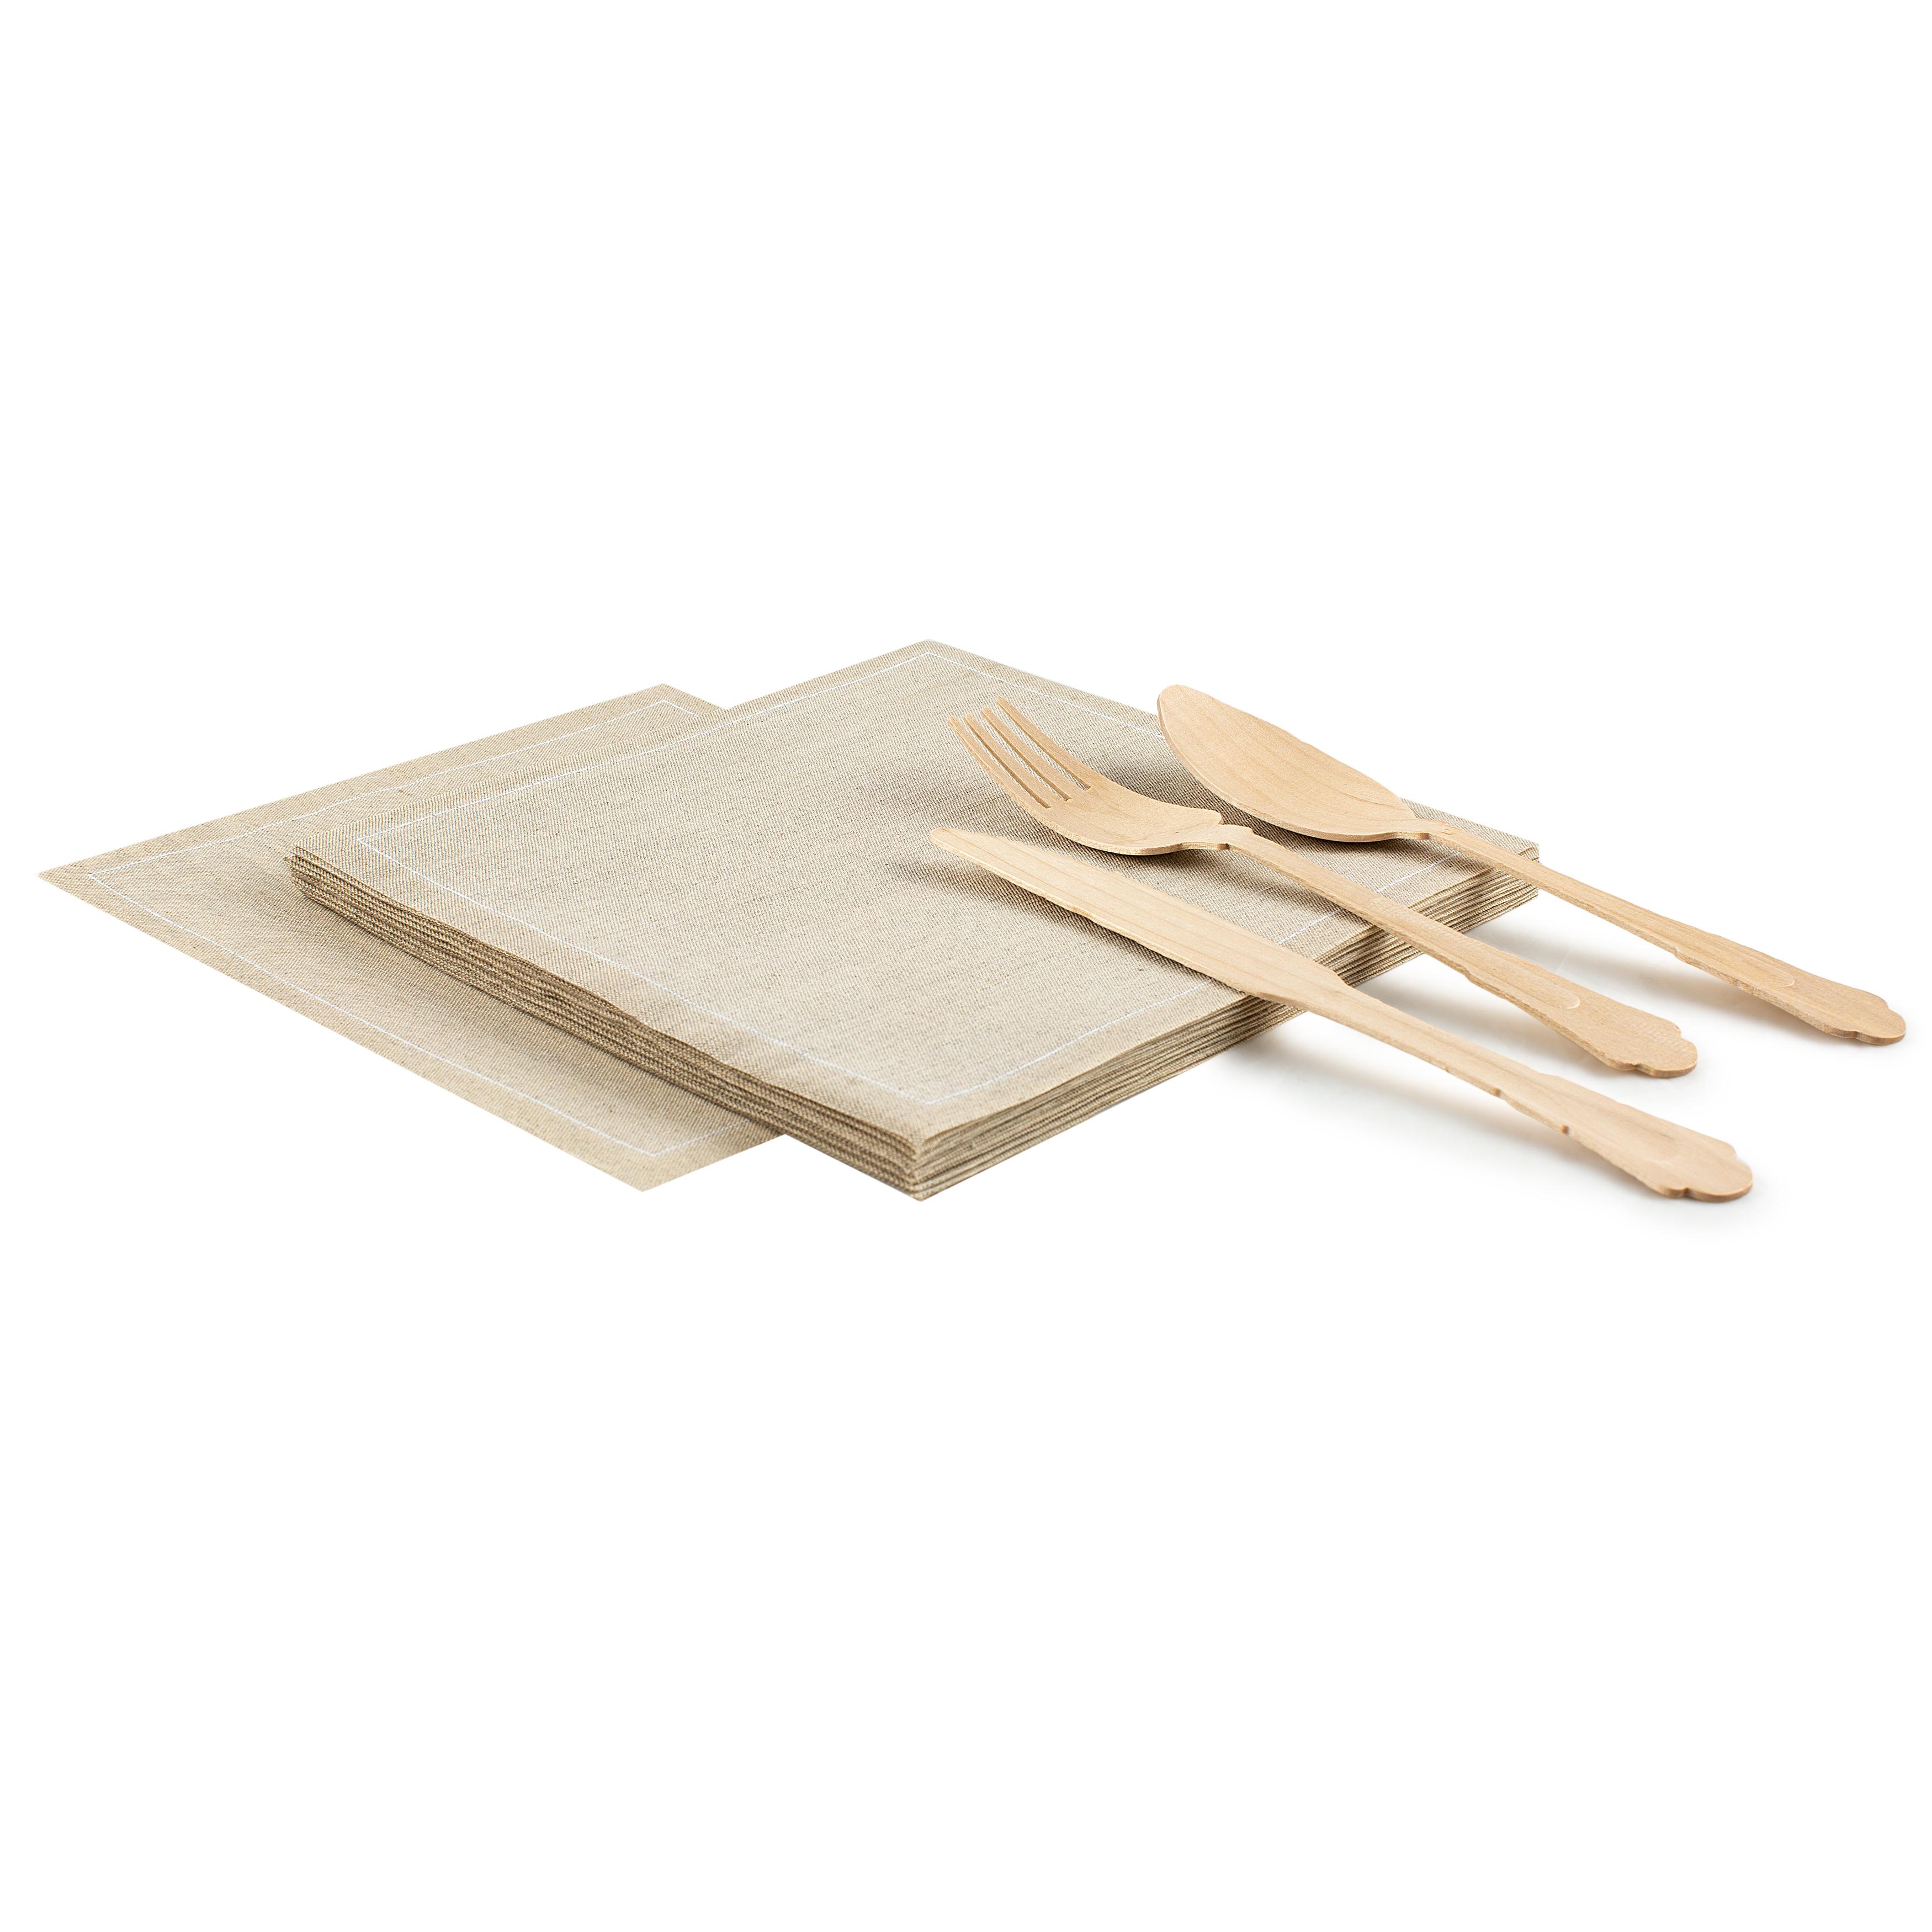 "Natural Linen Luncheon - 8"" x 8"" - 25 units"